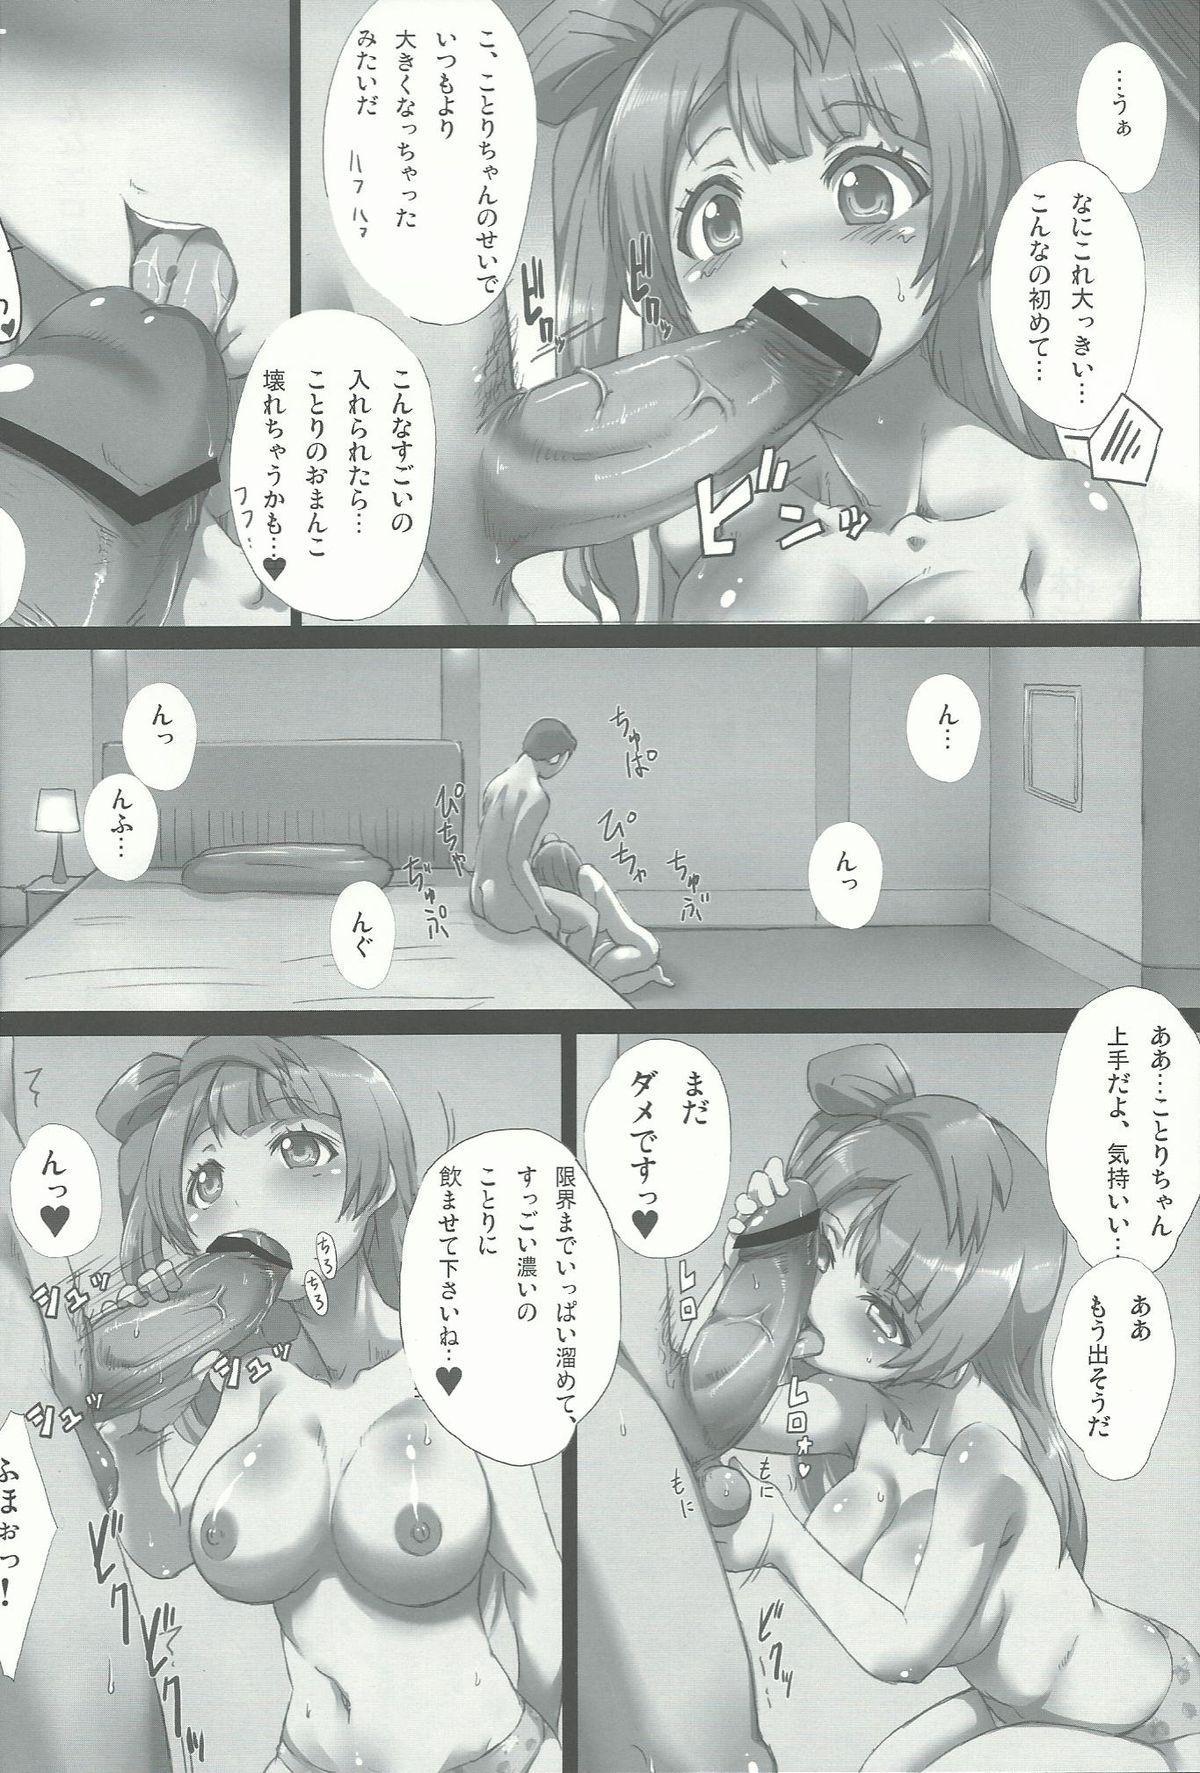 Kotori-chan de YanYan Suru Hon 10